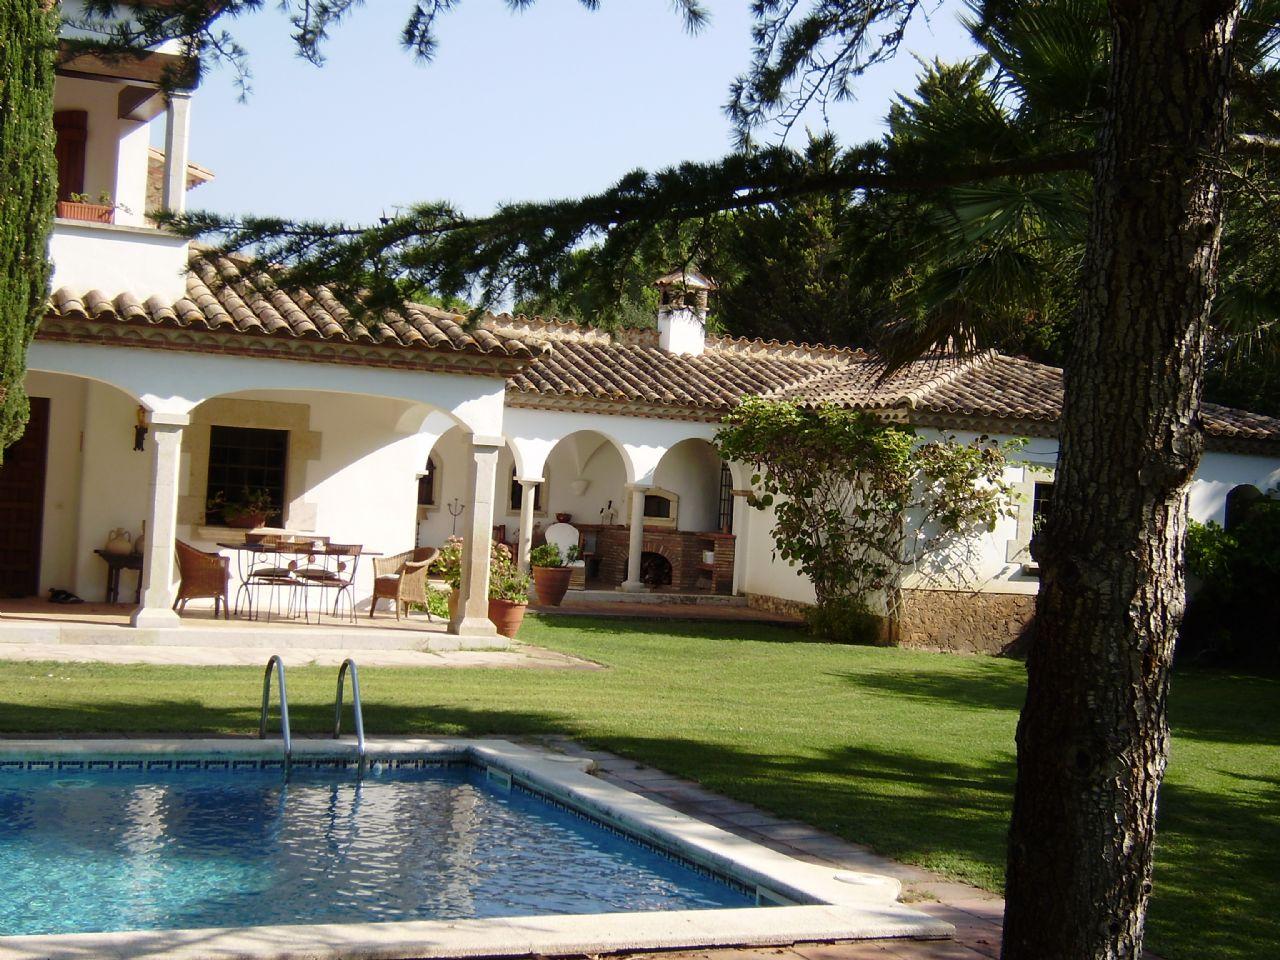 Villa de Lujo en Santa Cristina d'Aro, GOLF, venta